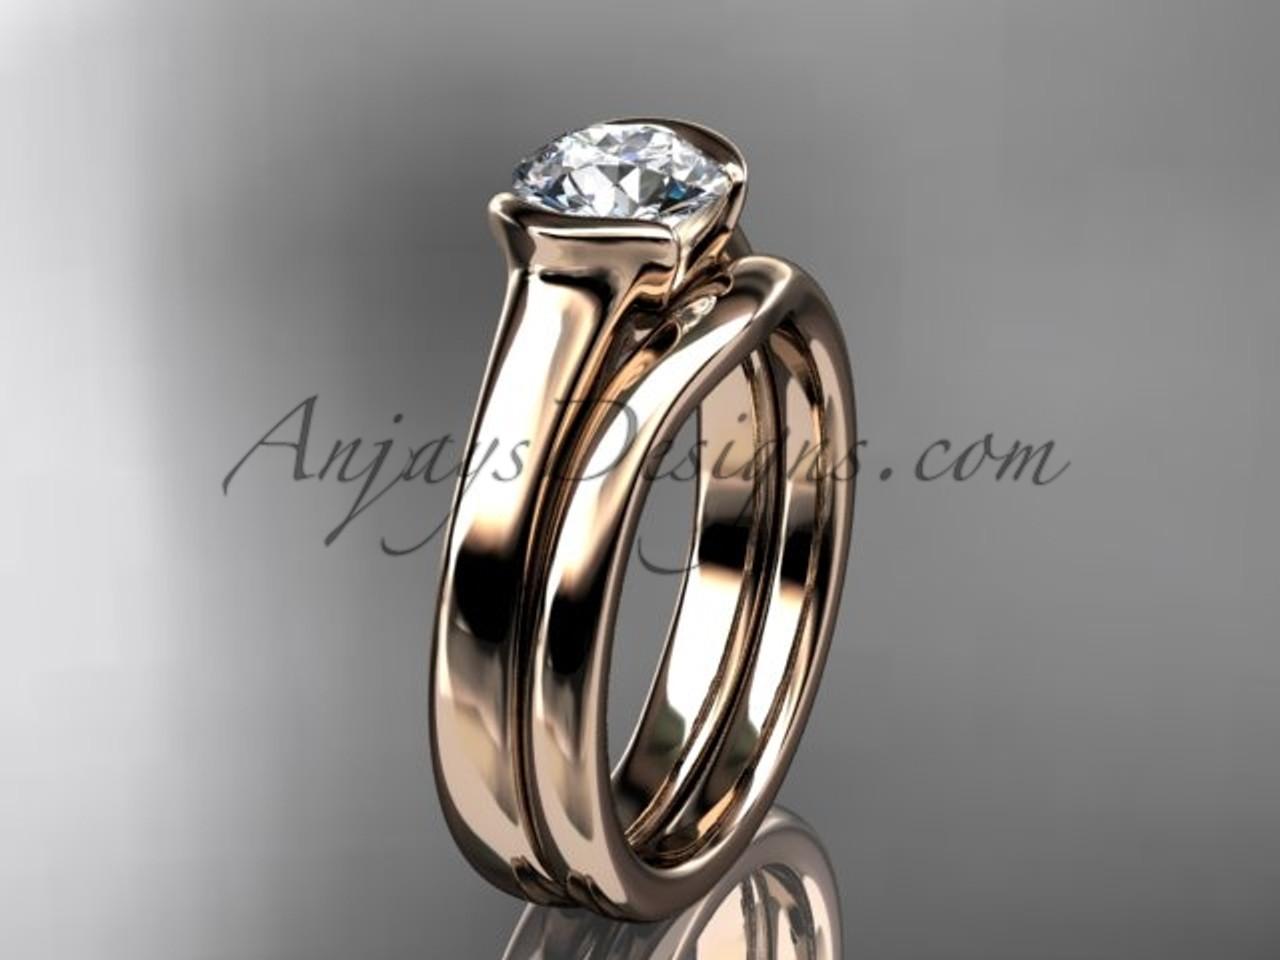 Wedding ring sets rose gold vintage ring vd10016s beautiful wedding ring sets rose gold vintage ring vd10016s junglespirit Choice Image